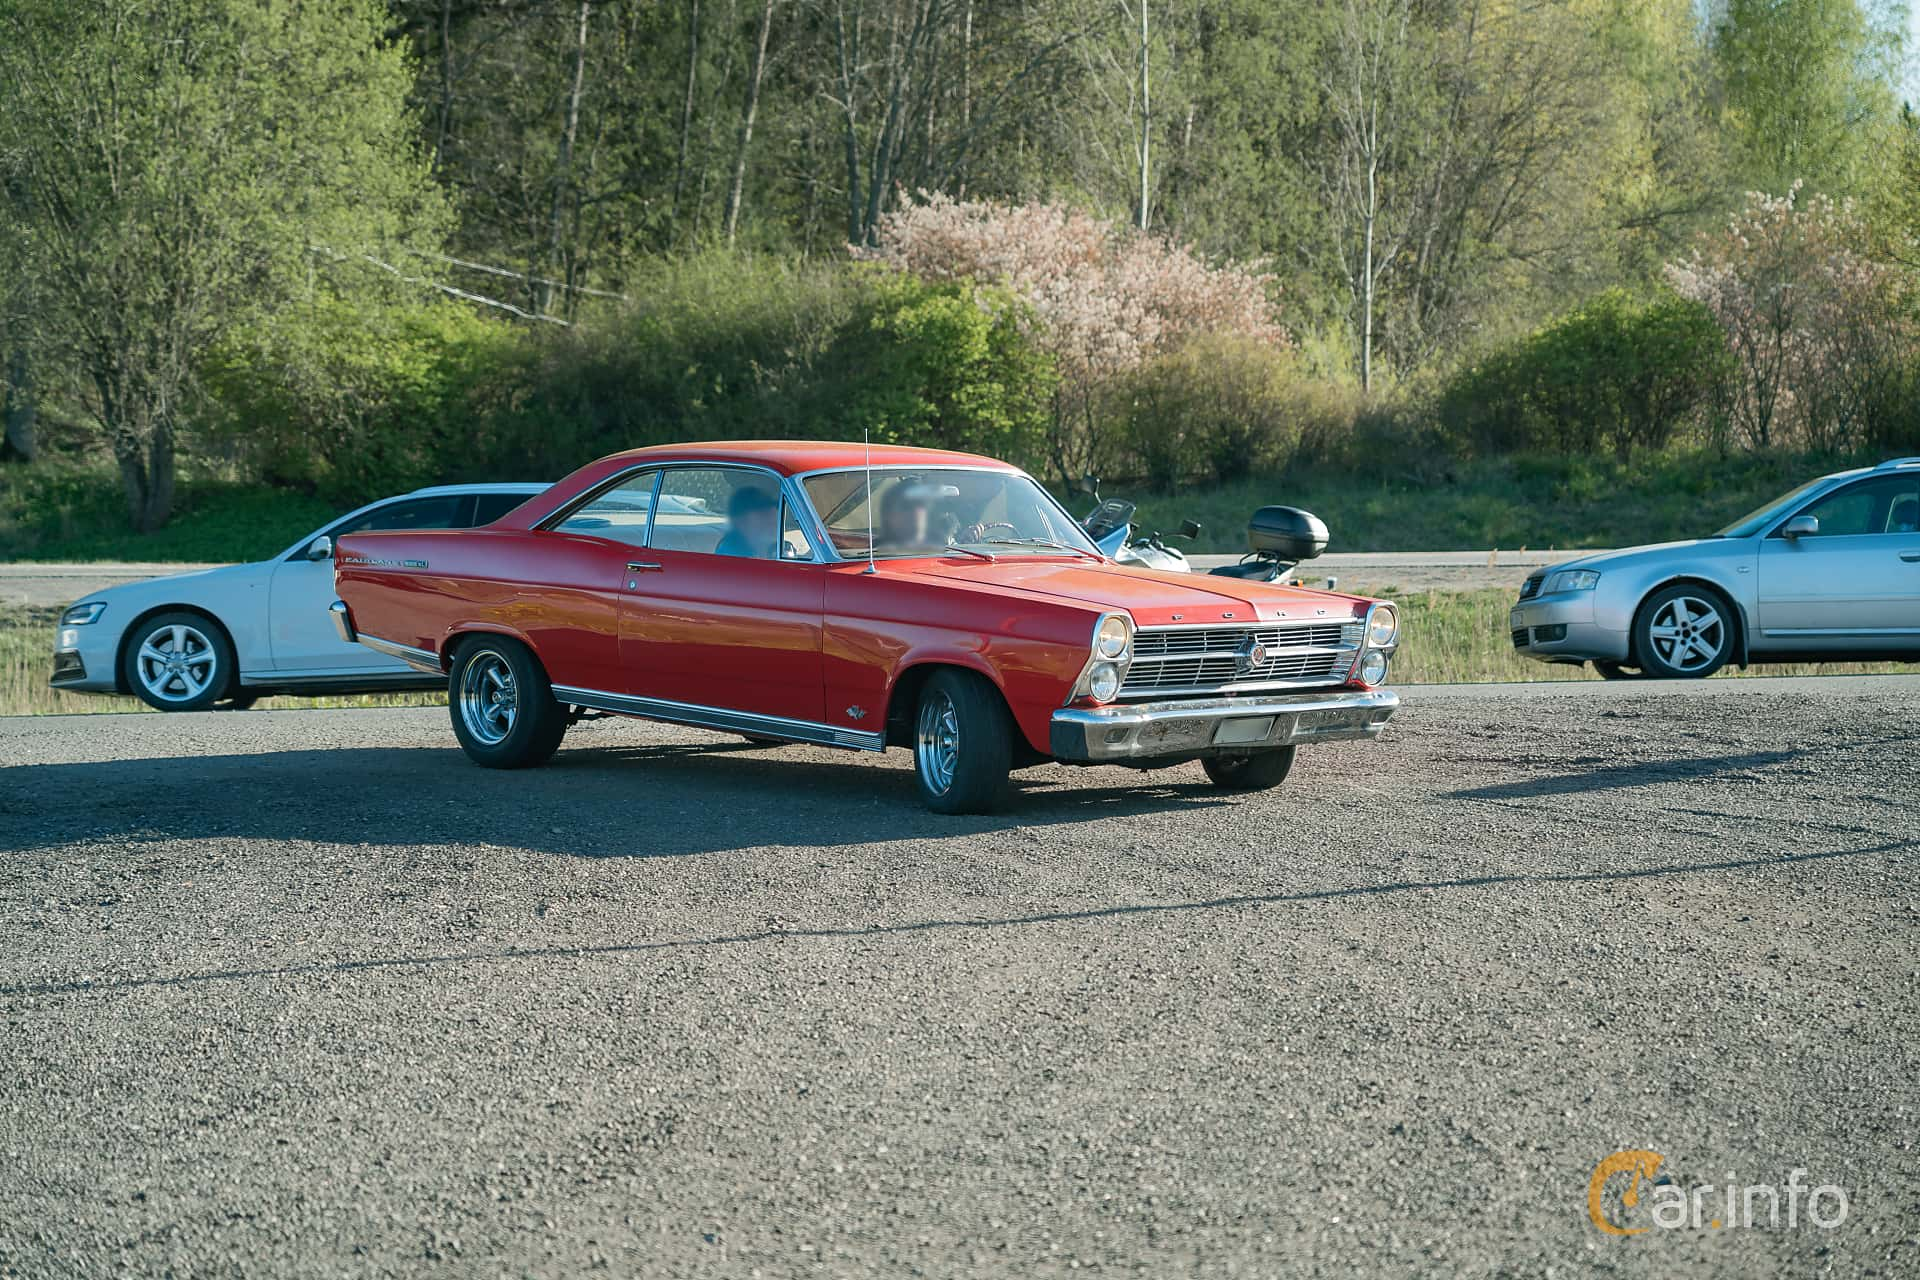 Ford Fairlane 500/XL Hardtop 4.7 V8 Automatic, 203hp, 1966 at Lissma Classic Car 2019 vecka 20